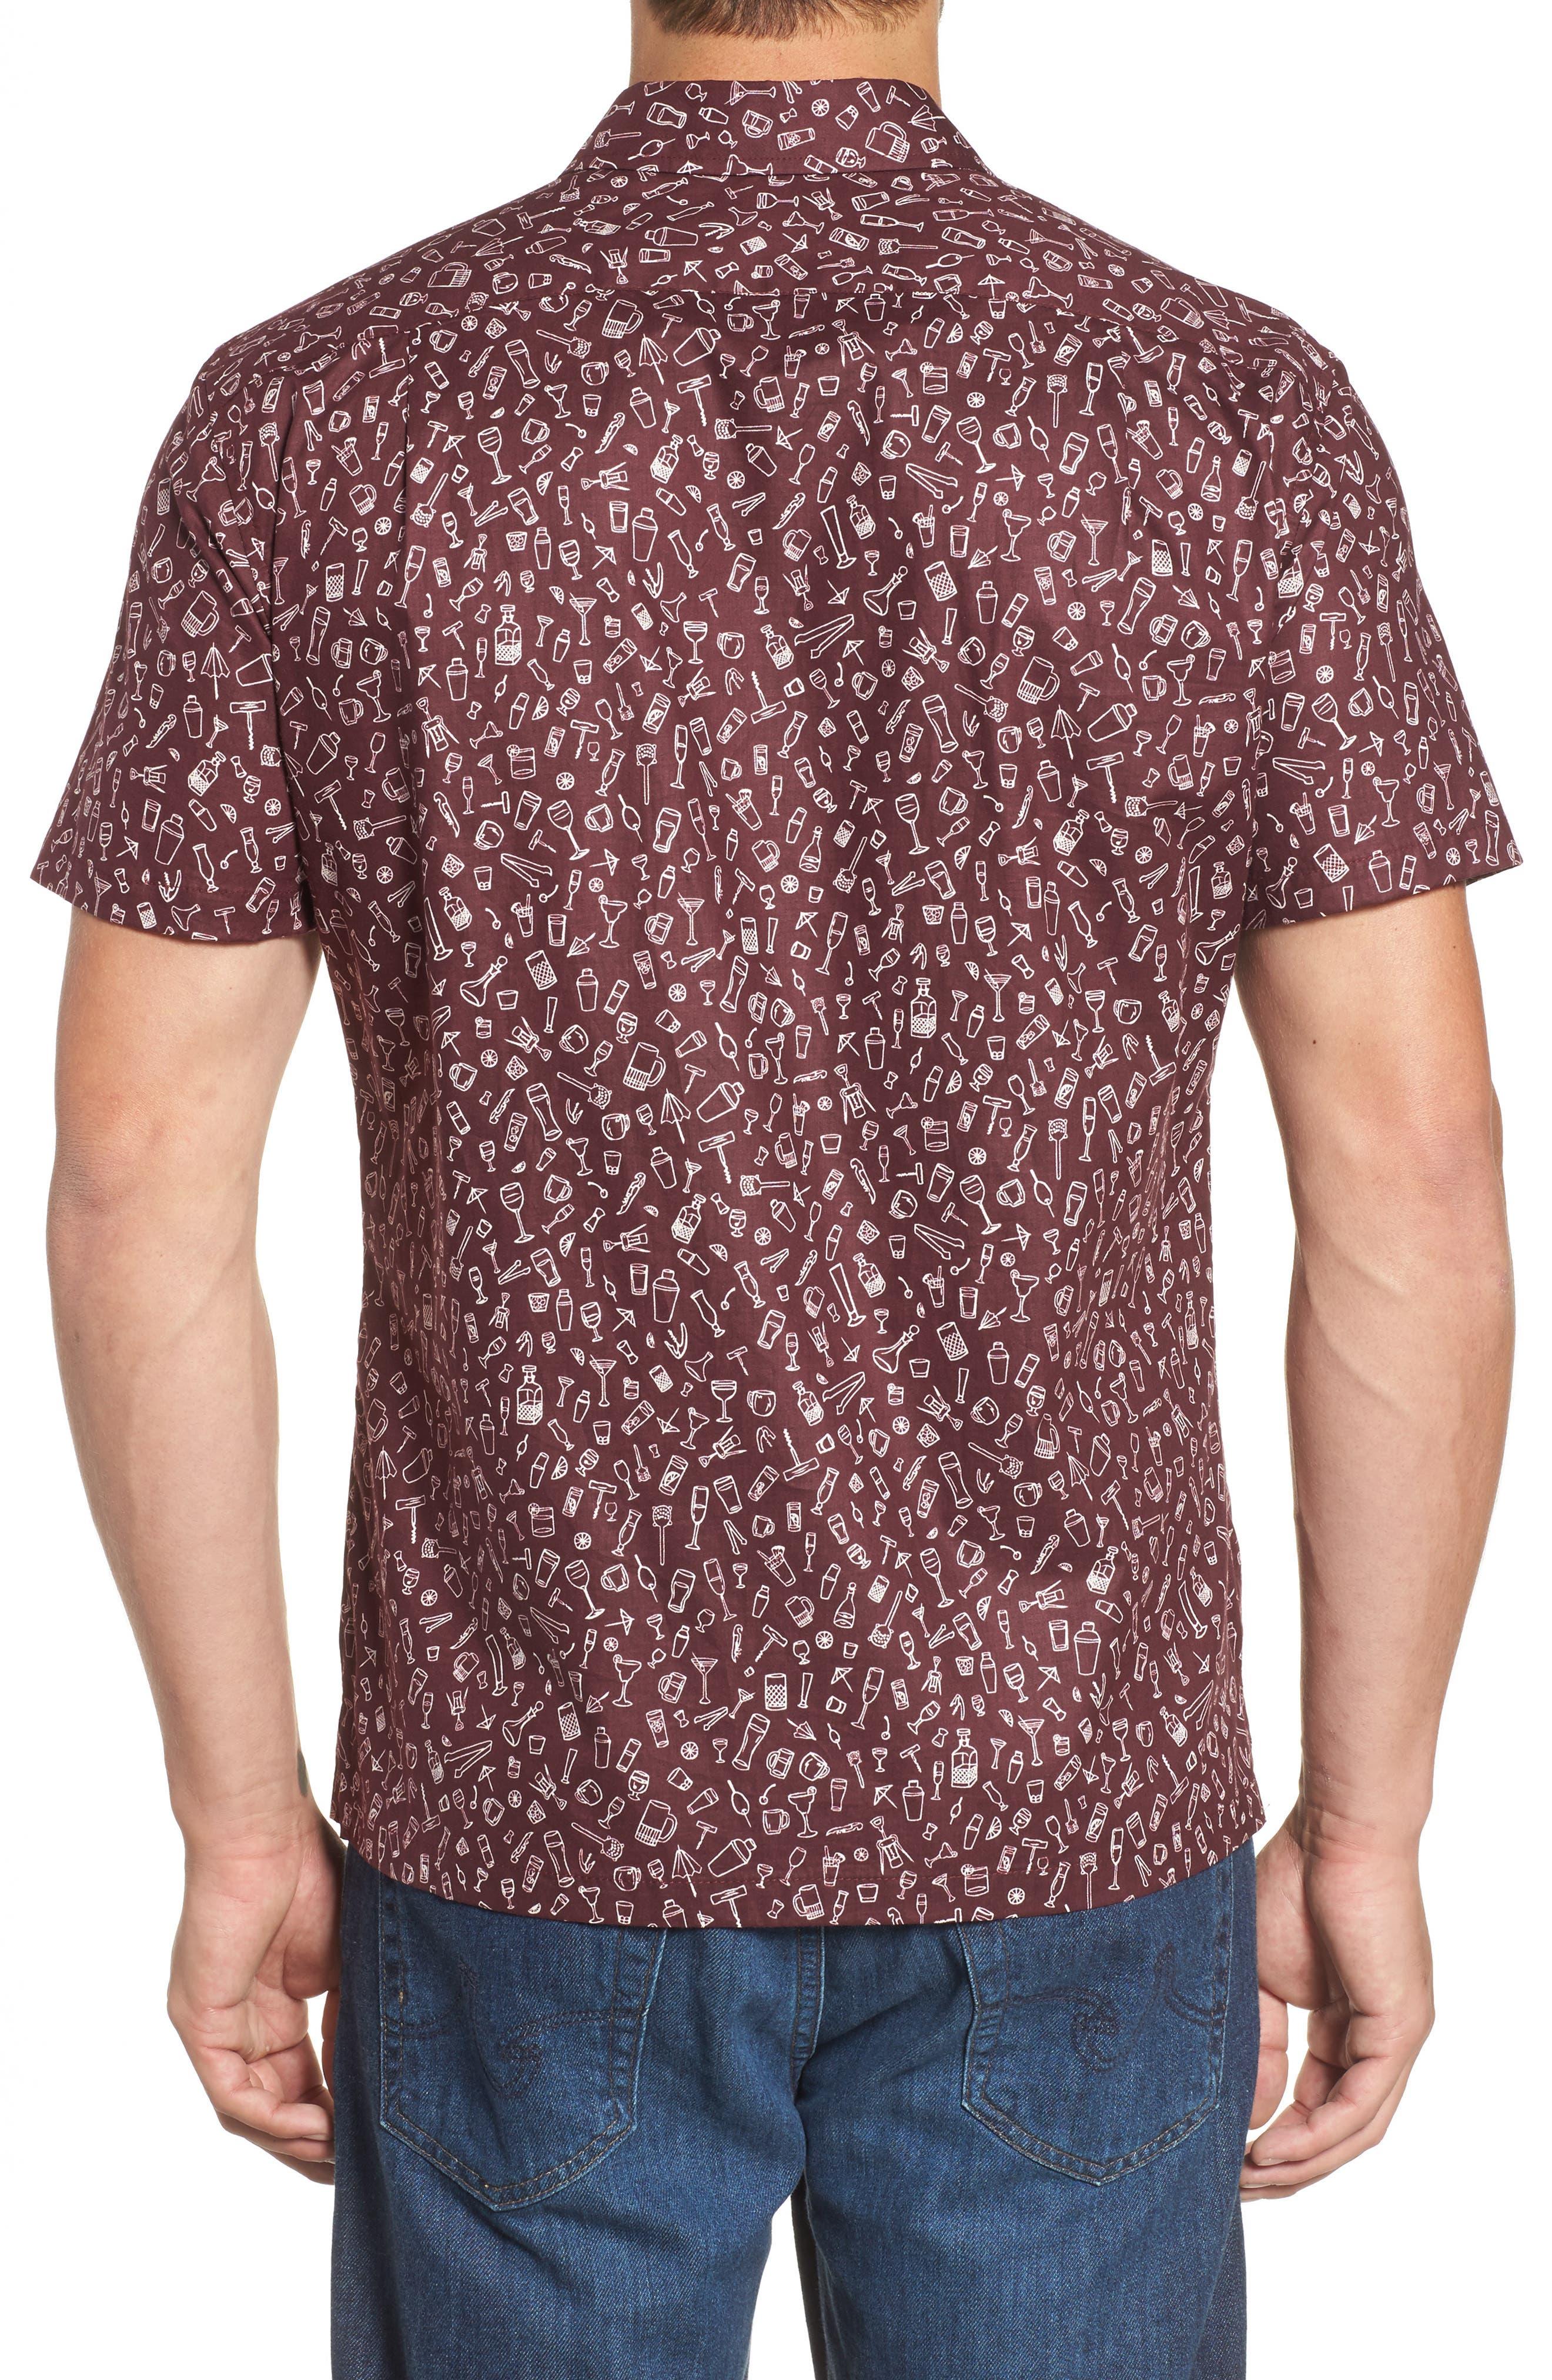 5 PM Slim Fit Camp Shirt,                             Alternate thumbnail 2, color,                             600